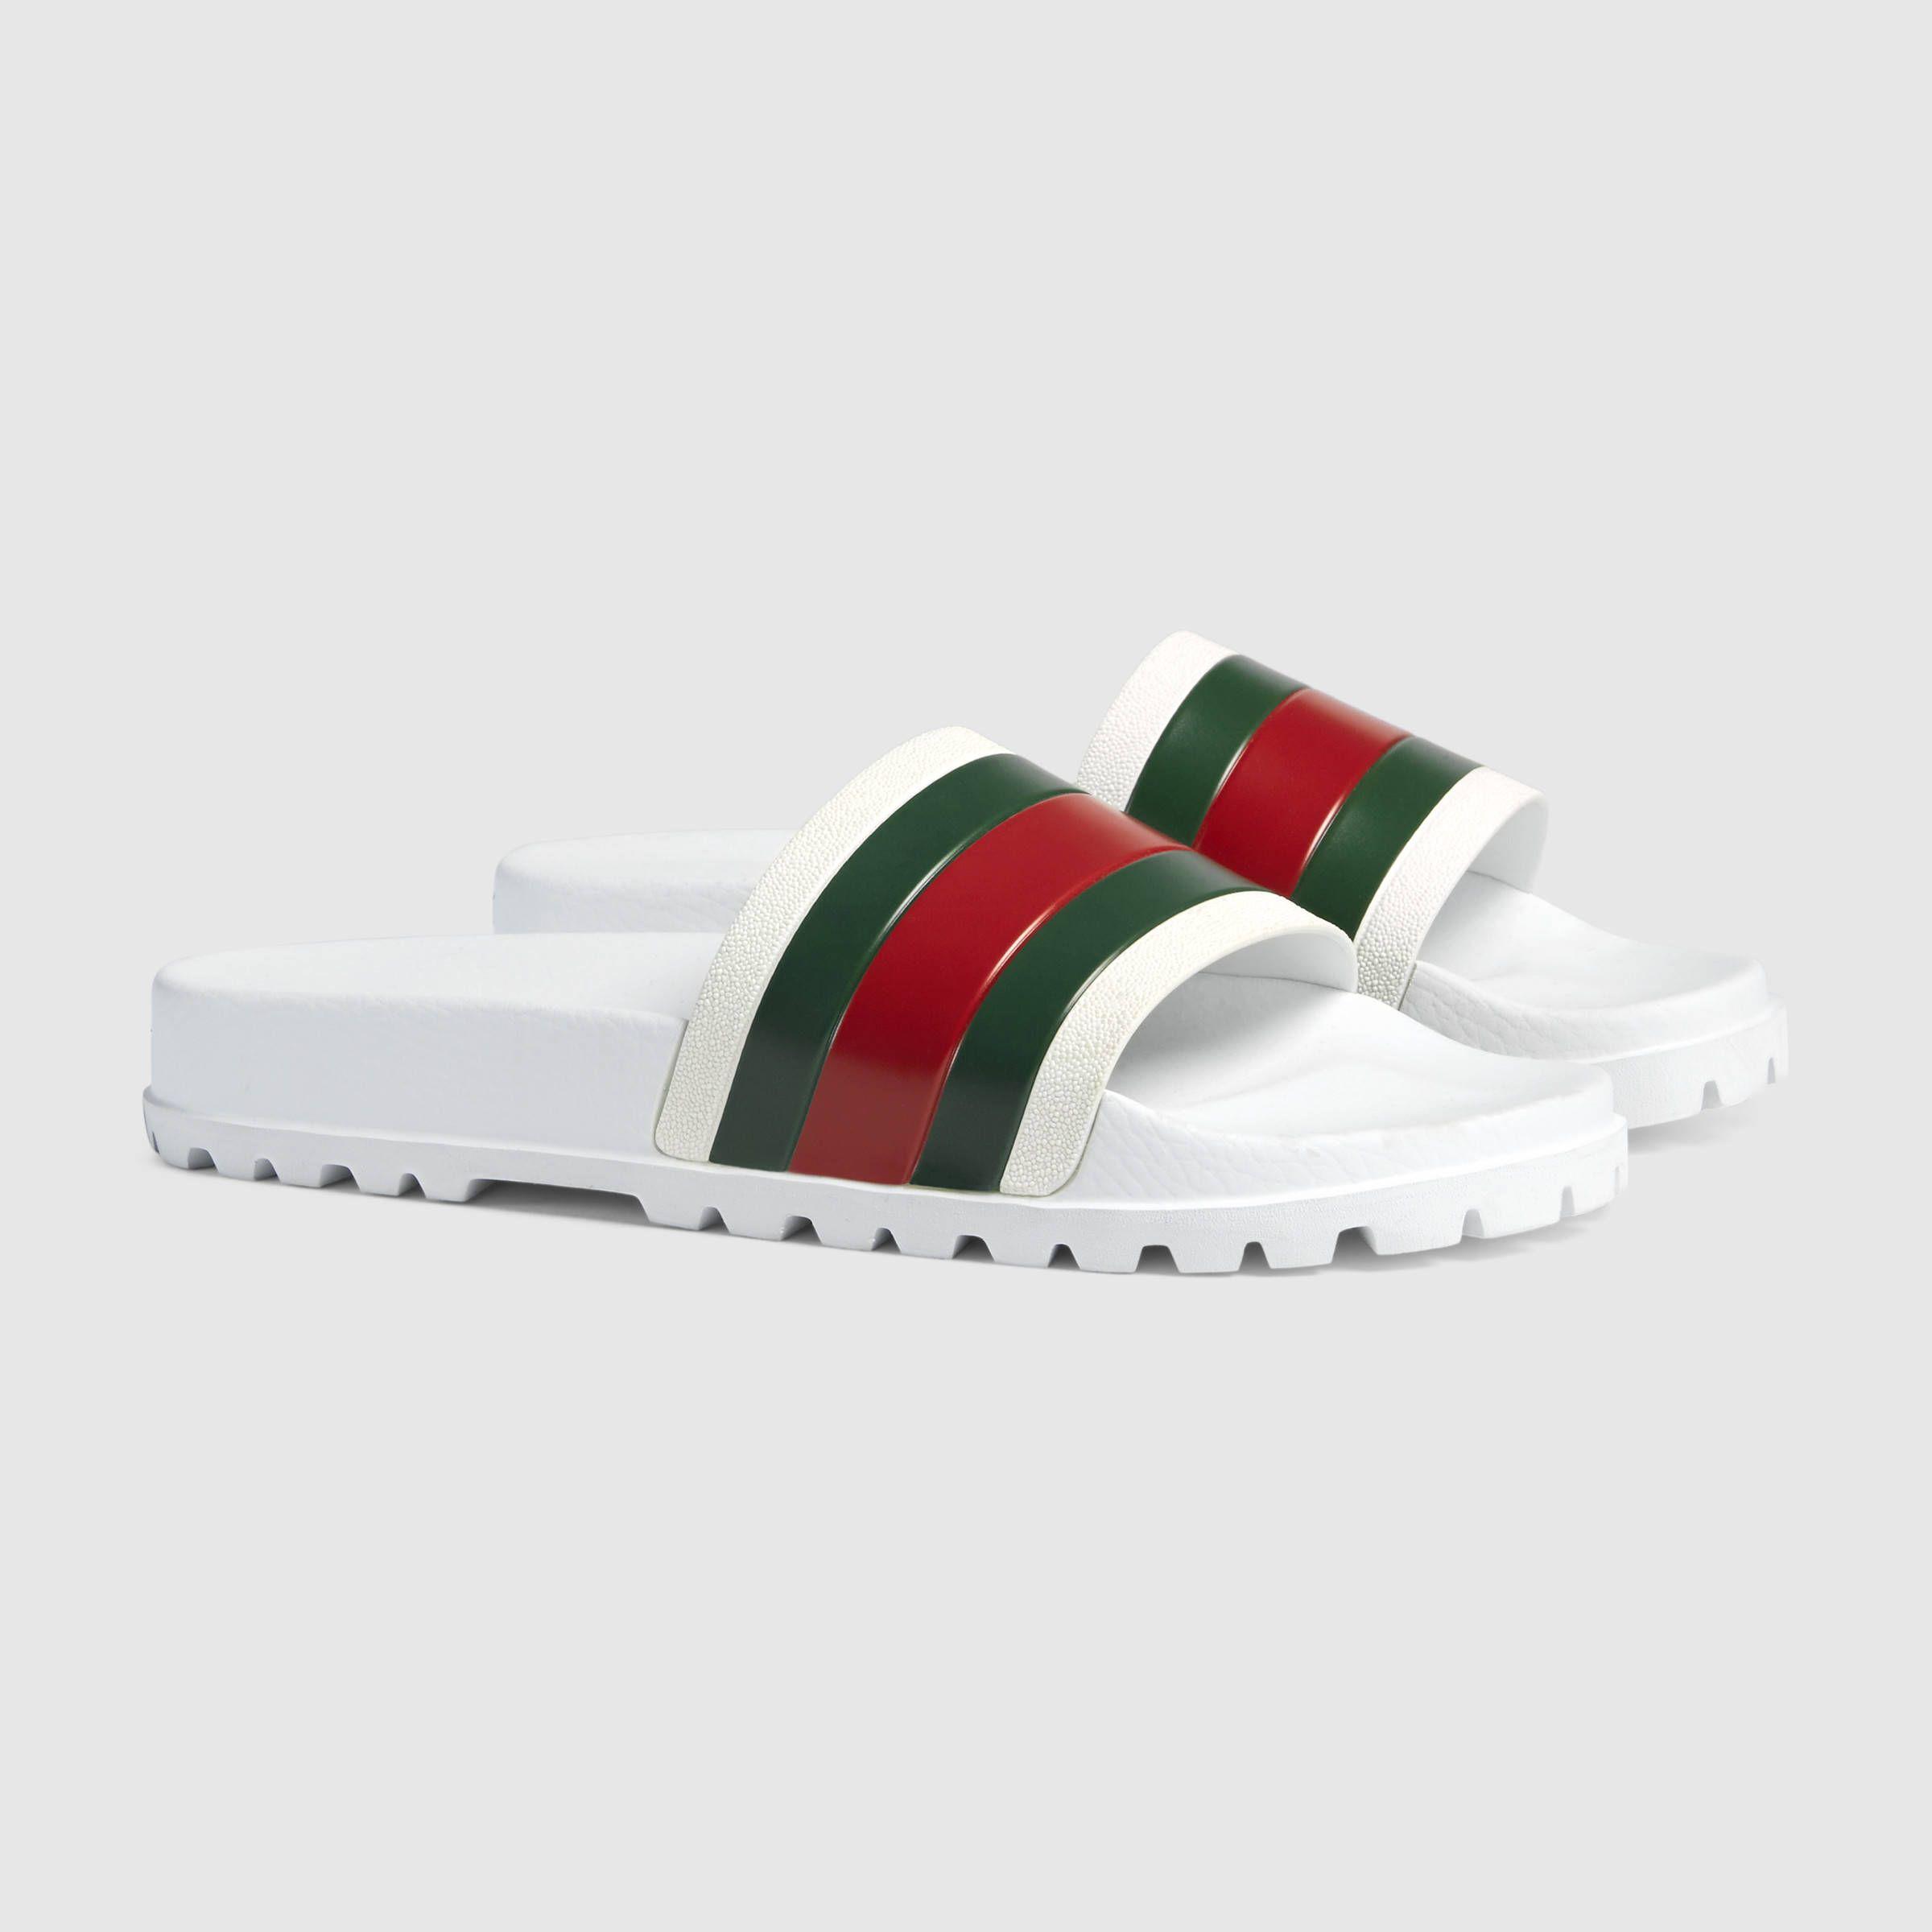 7826a1c44 Gucci Web slide sandal Detail 2